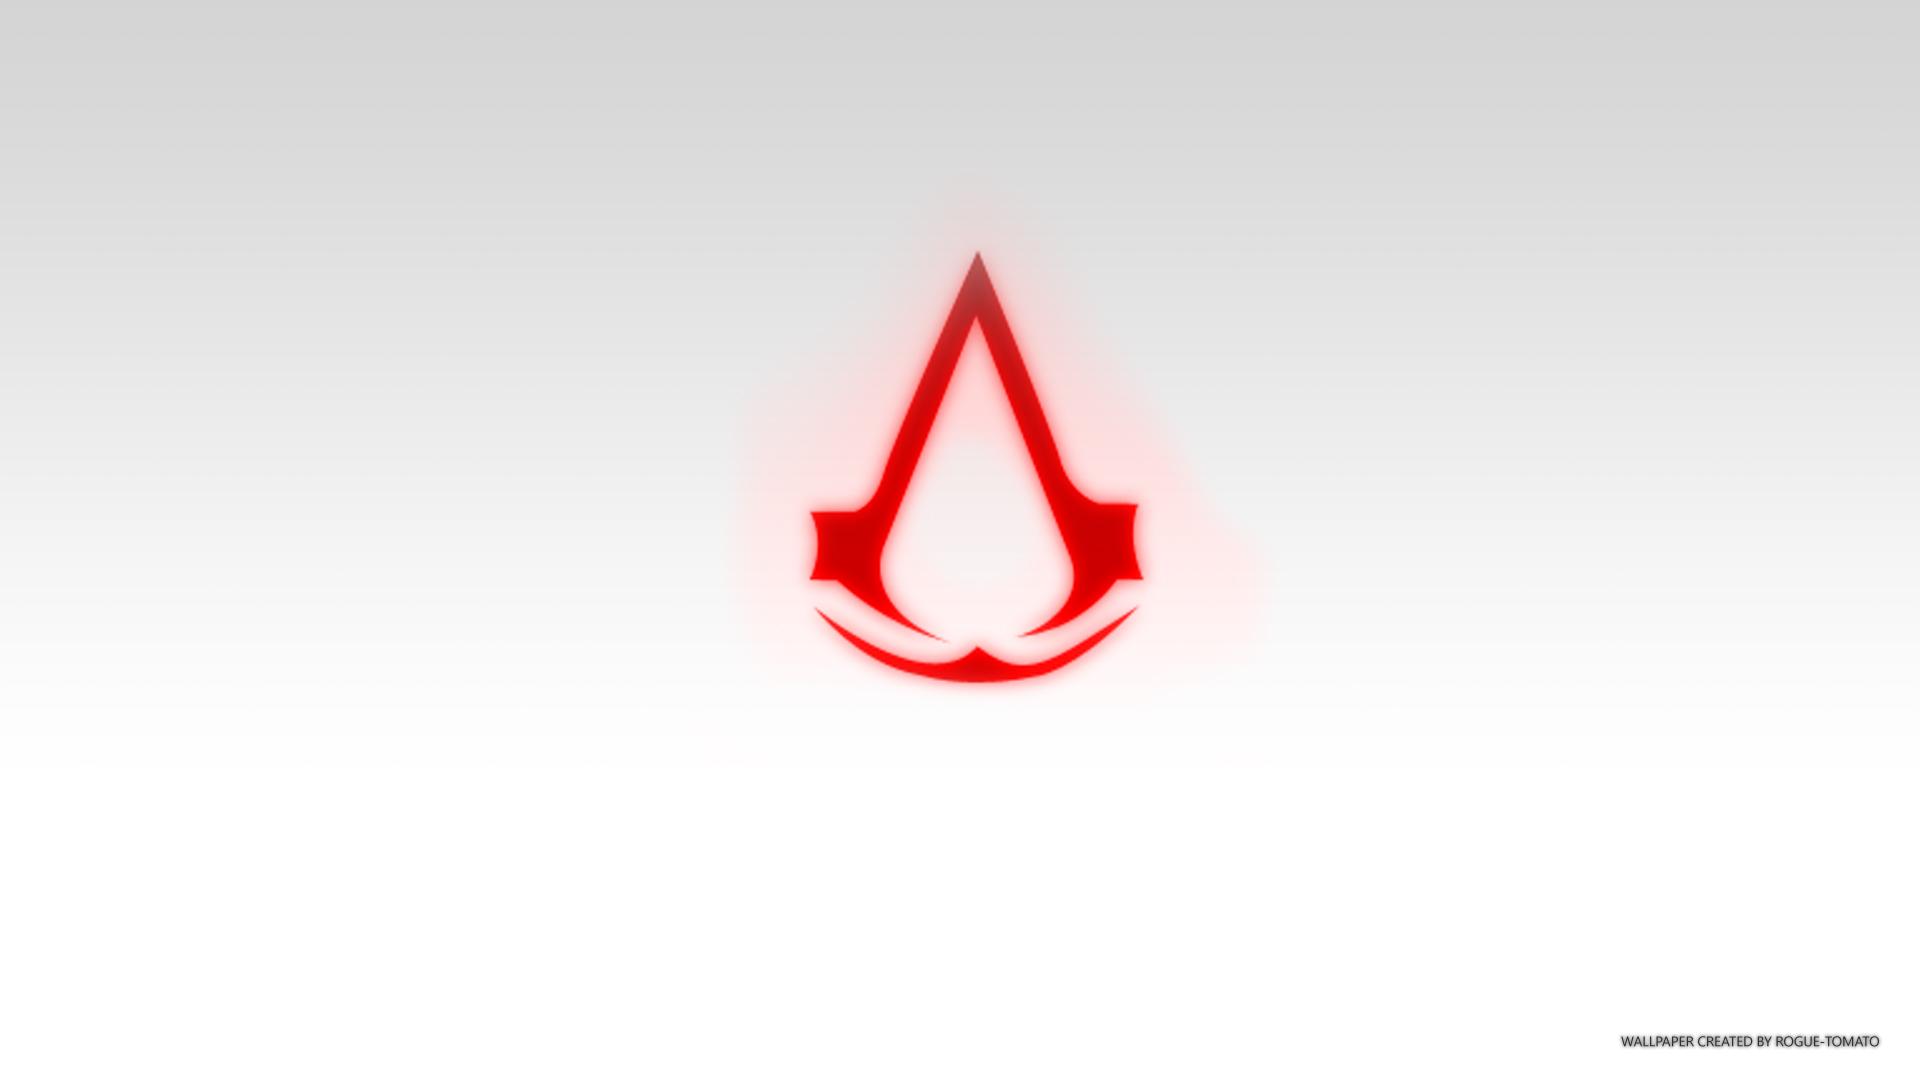 assassinand 39 s creed unity logo. image from http://25.media.tumblr.com/tumblr_me8k3emdpq1r96ie5o1_r1_500.gif.   αѕѕαѕѕιиѕ ¢яєє∂ ιѕ ℓιfє pinterest assassinand 39 s creed unity logo